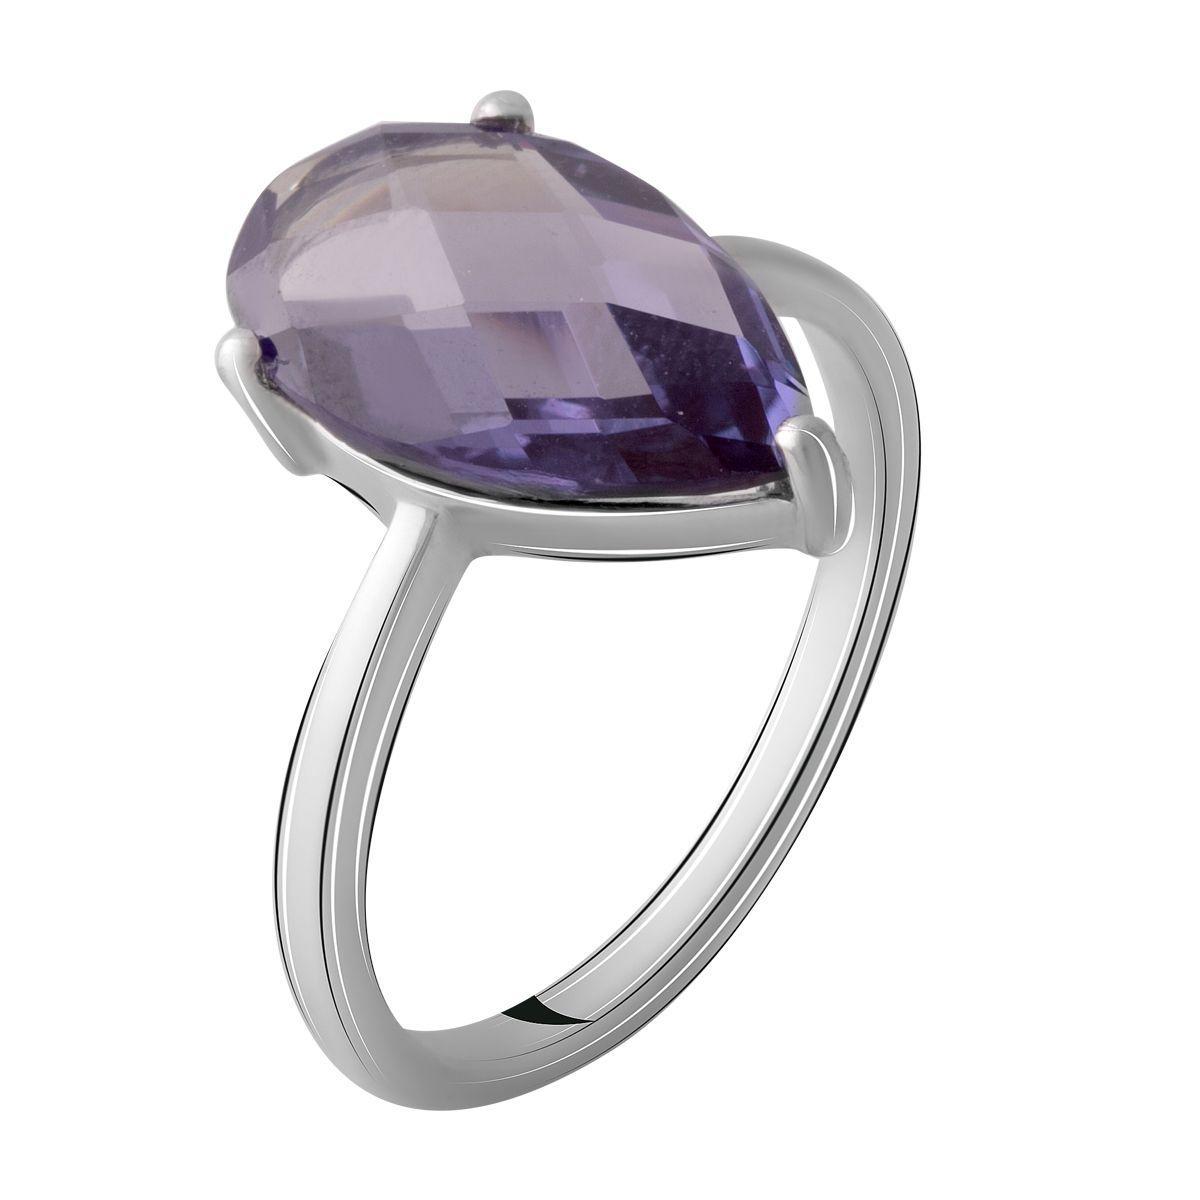 Серебряное кольцо DreamJewelry с олександритом 5.94ct (2050179) 18 размер